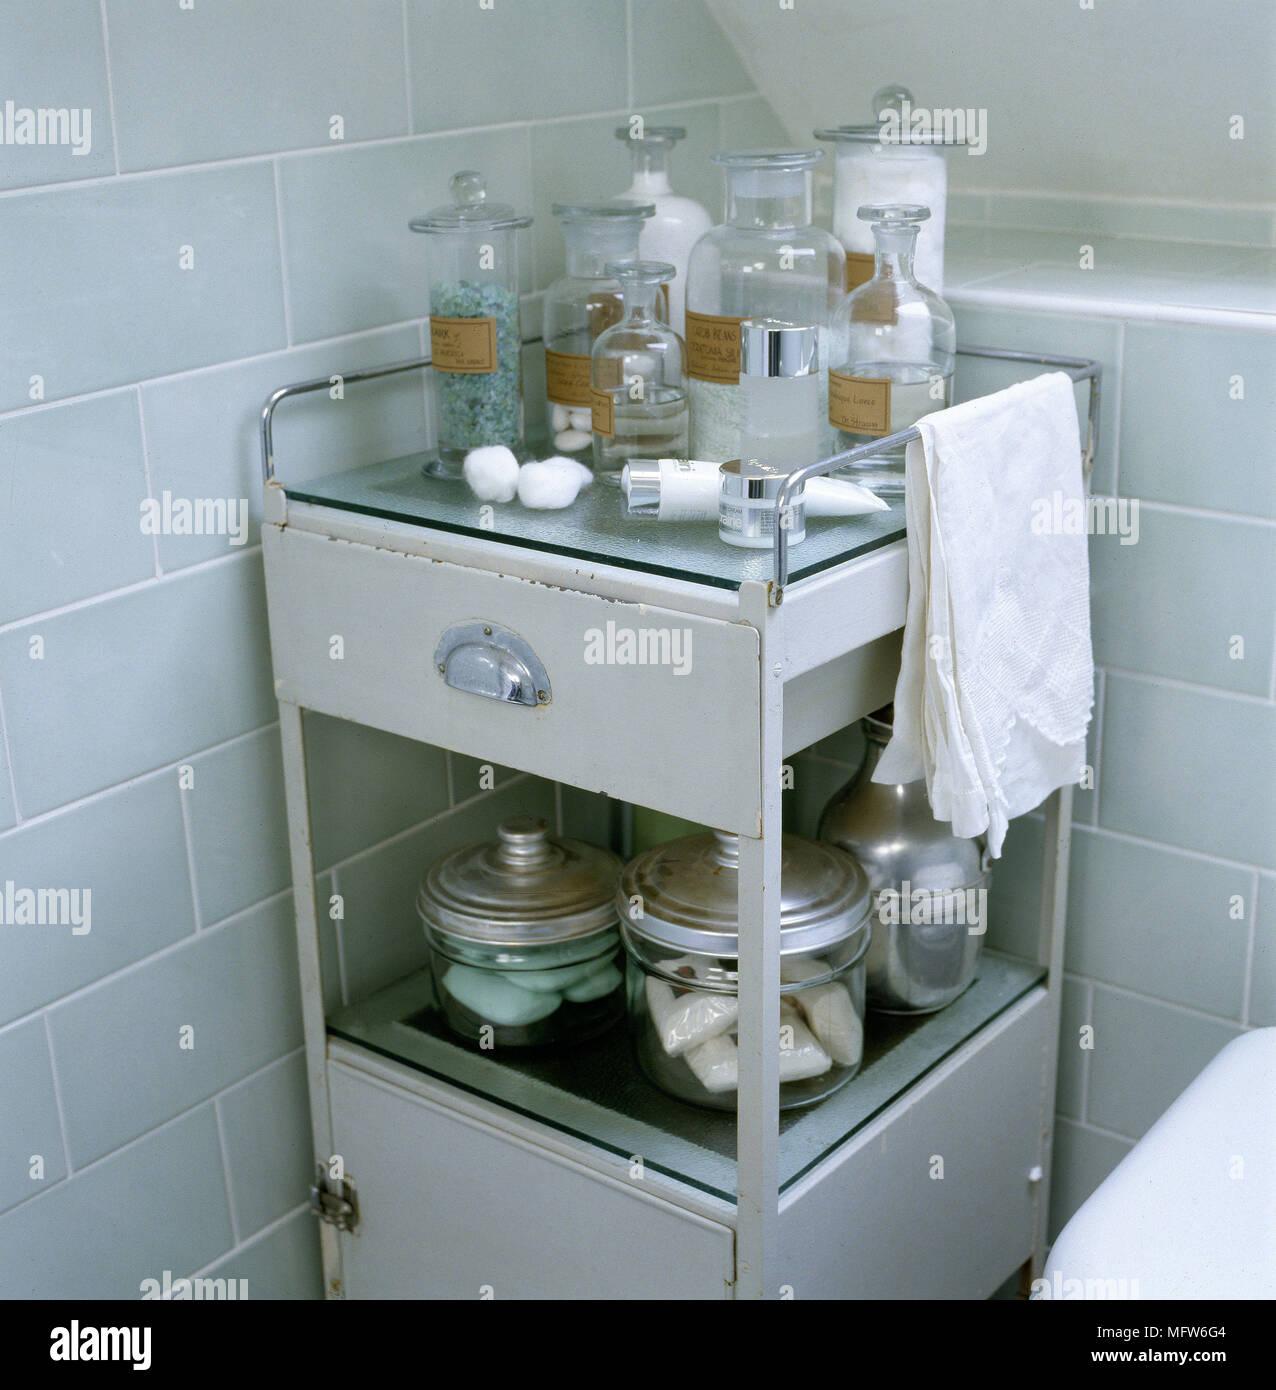 Bathroom Cabinet Isolated Stock Photos & Bathroom Cabinet Isolated ...